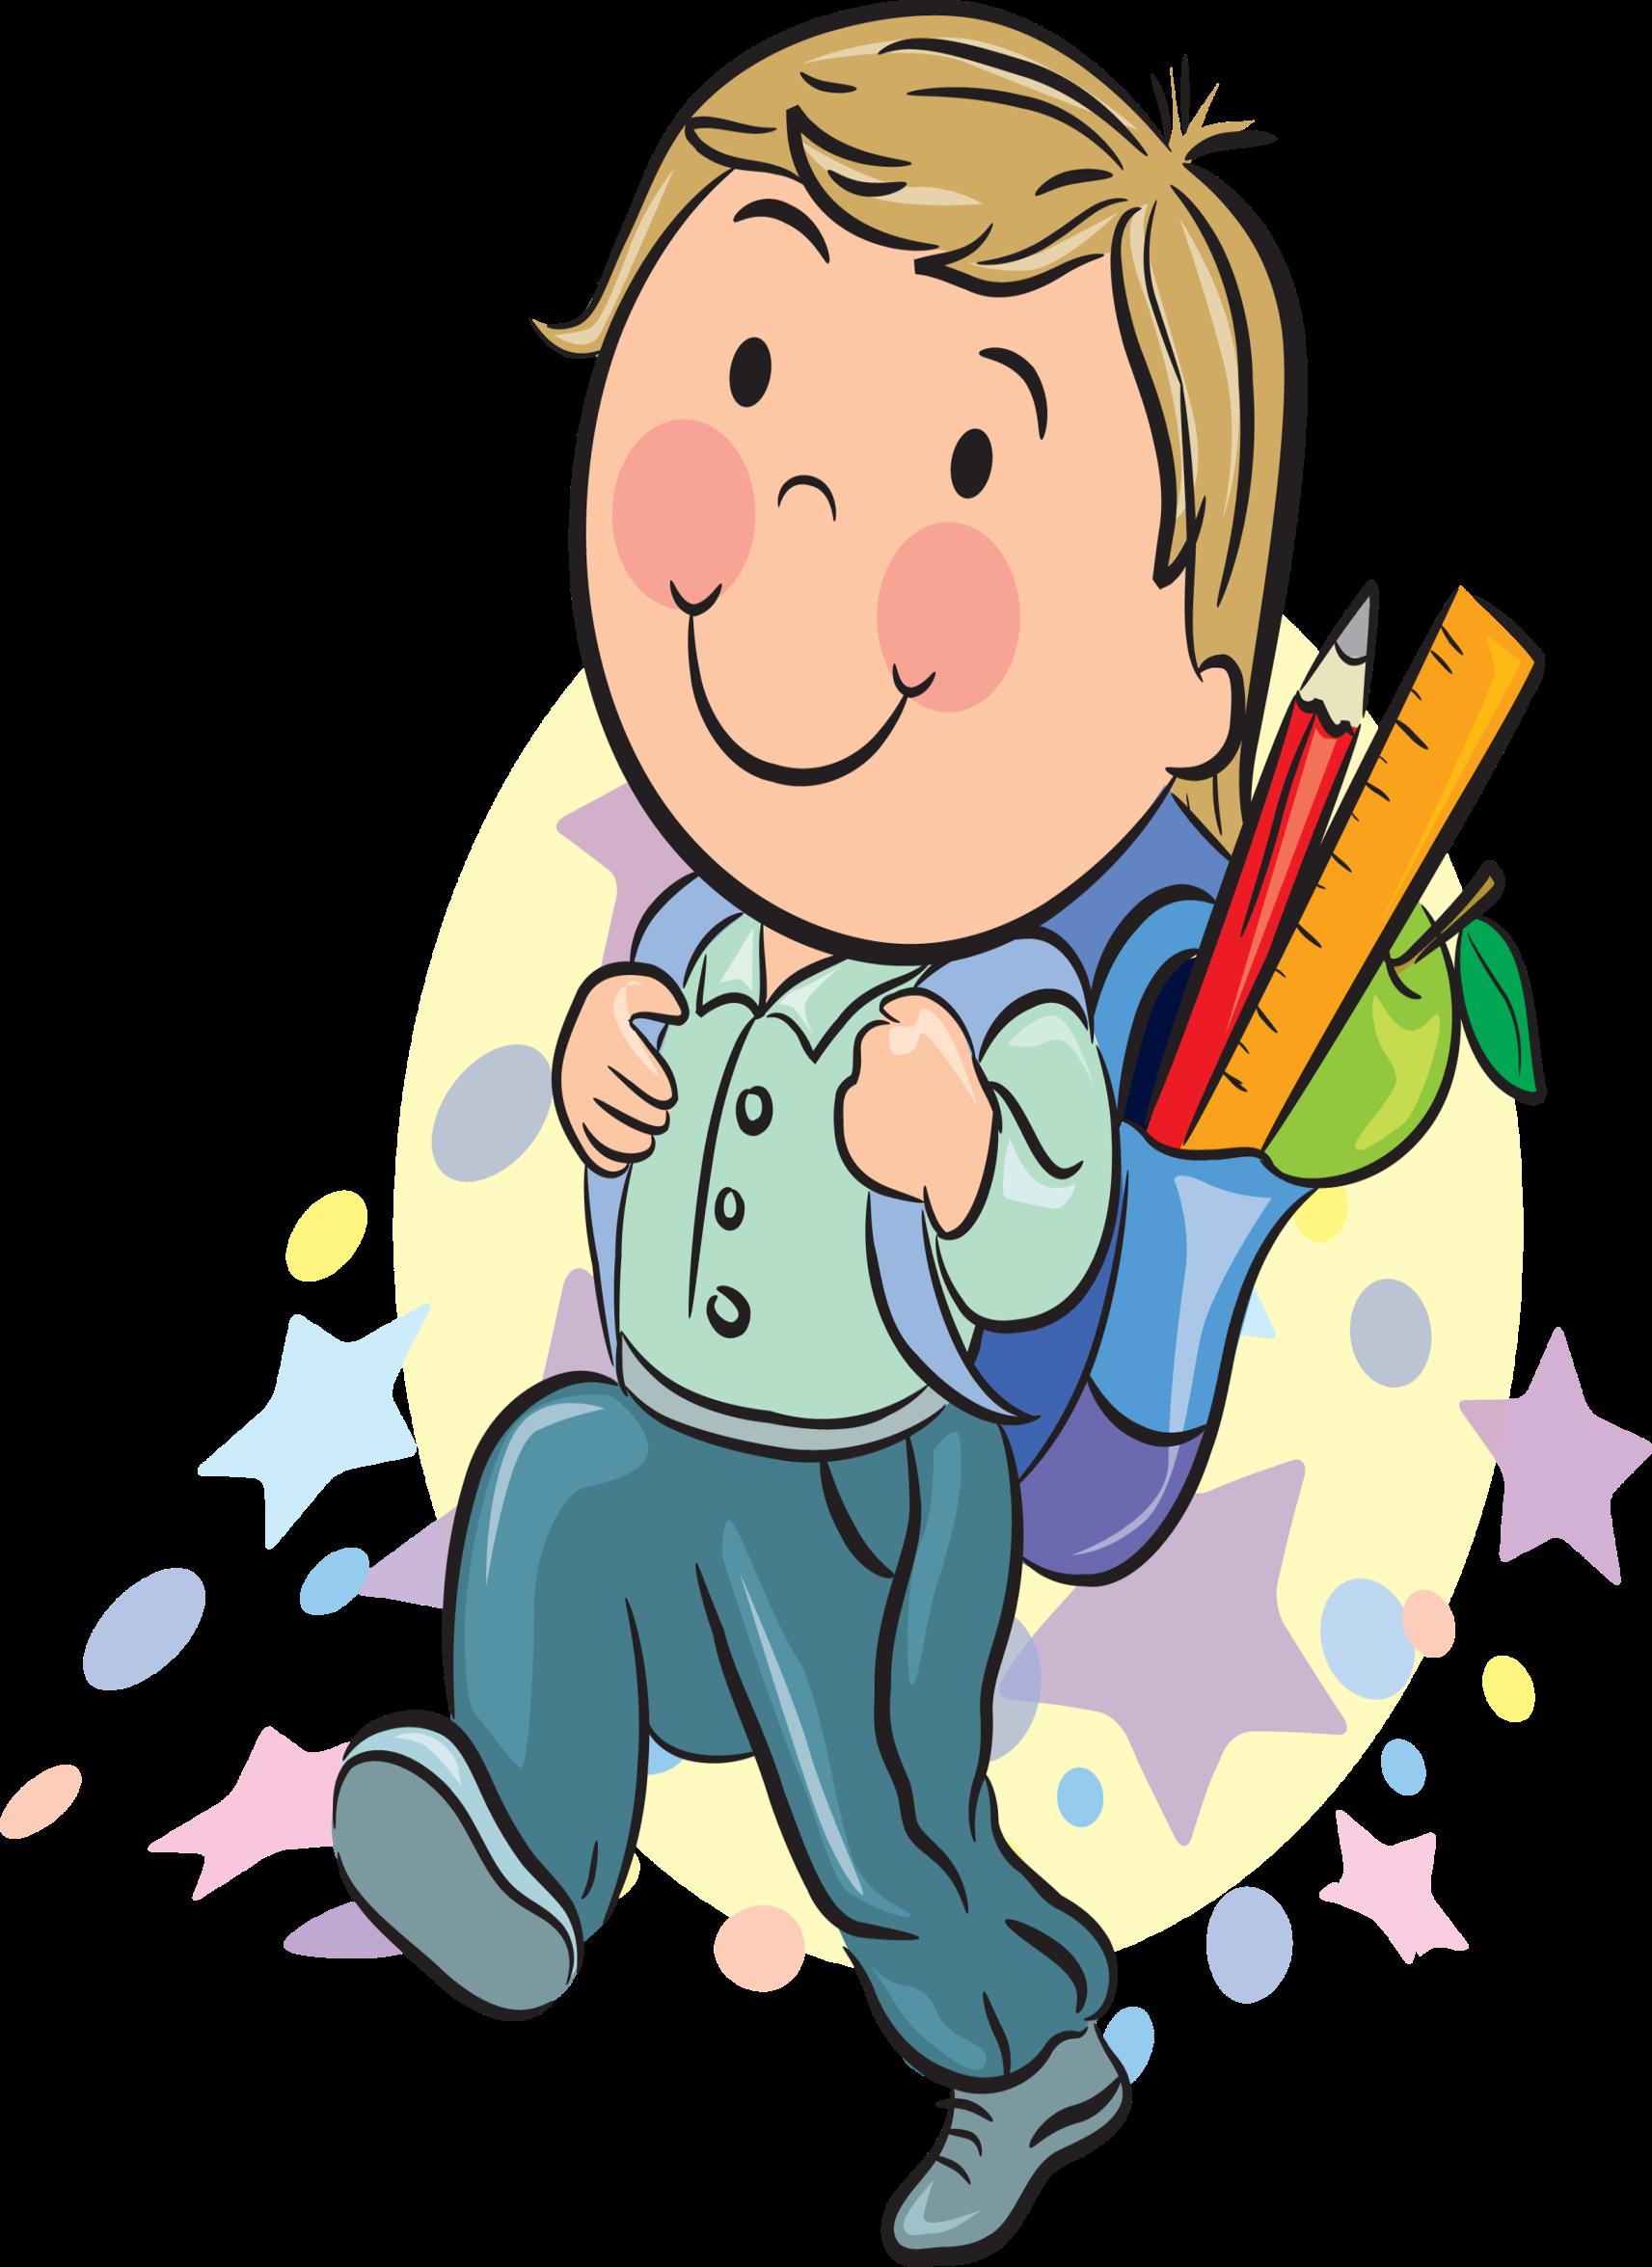 Веселый школьник картинка